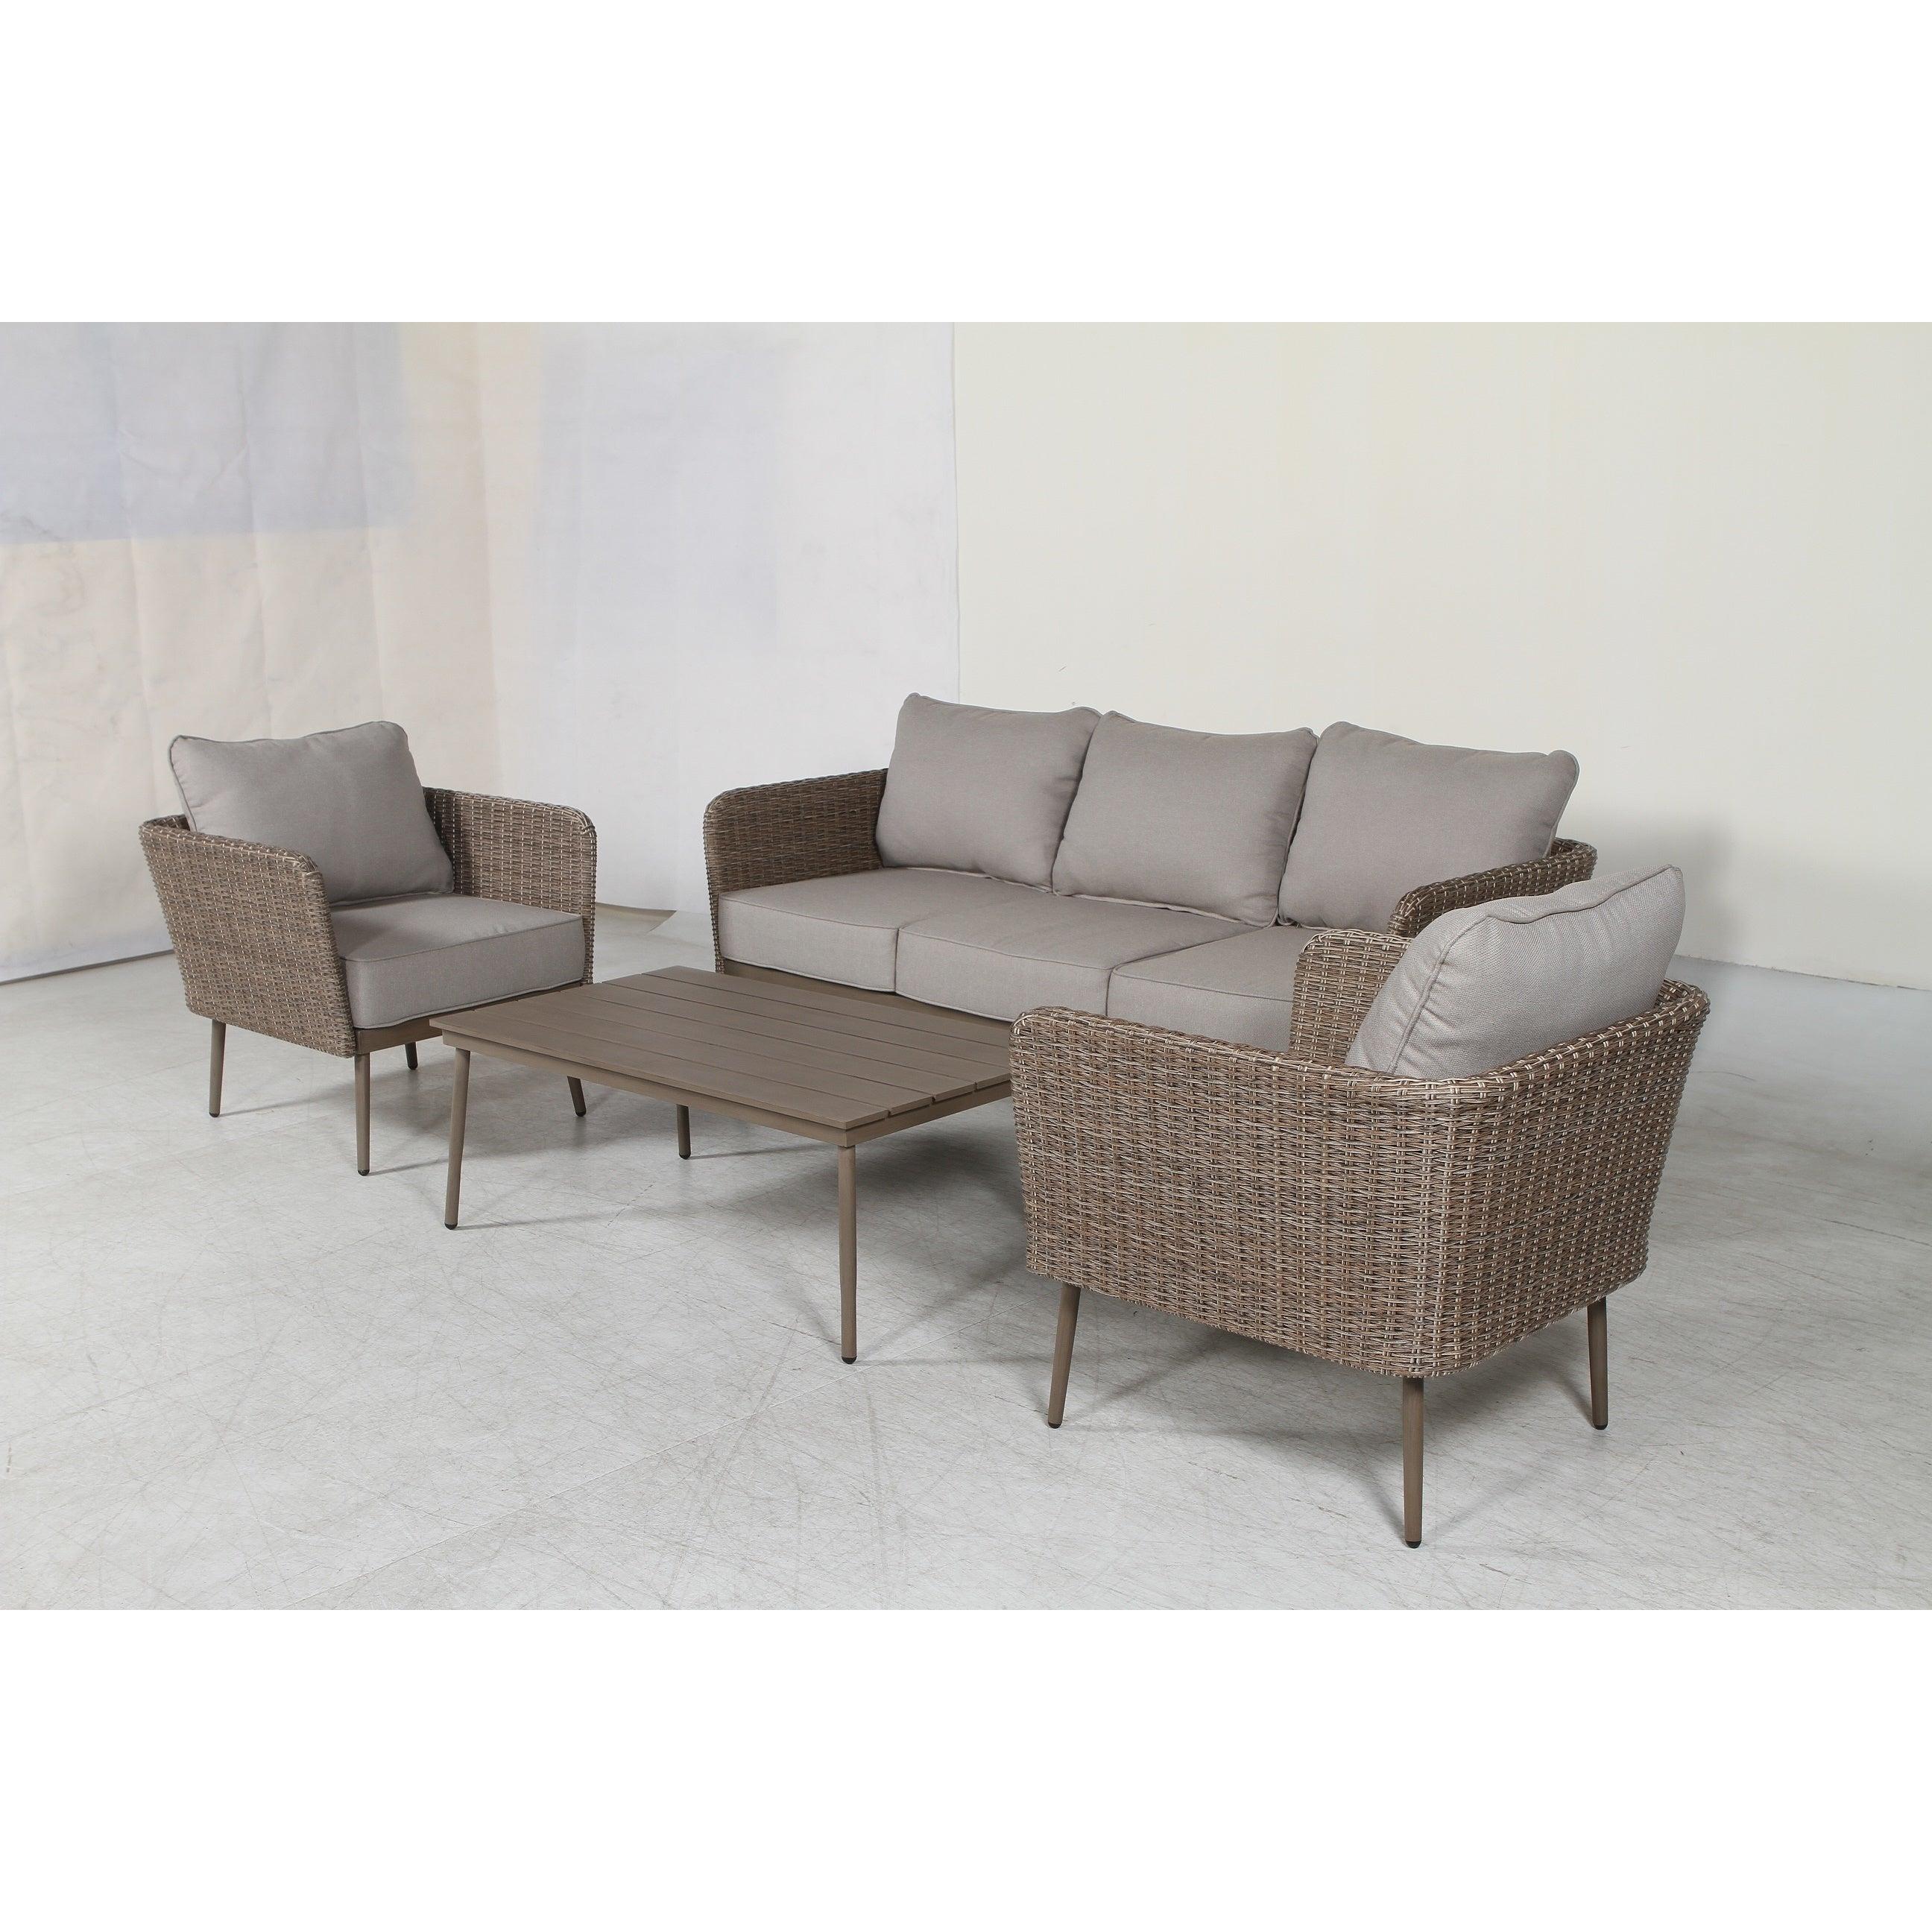 Shop Capri Wicker Patio Sofa Set   Free Shipping Today   Overstock    15857148